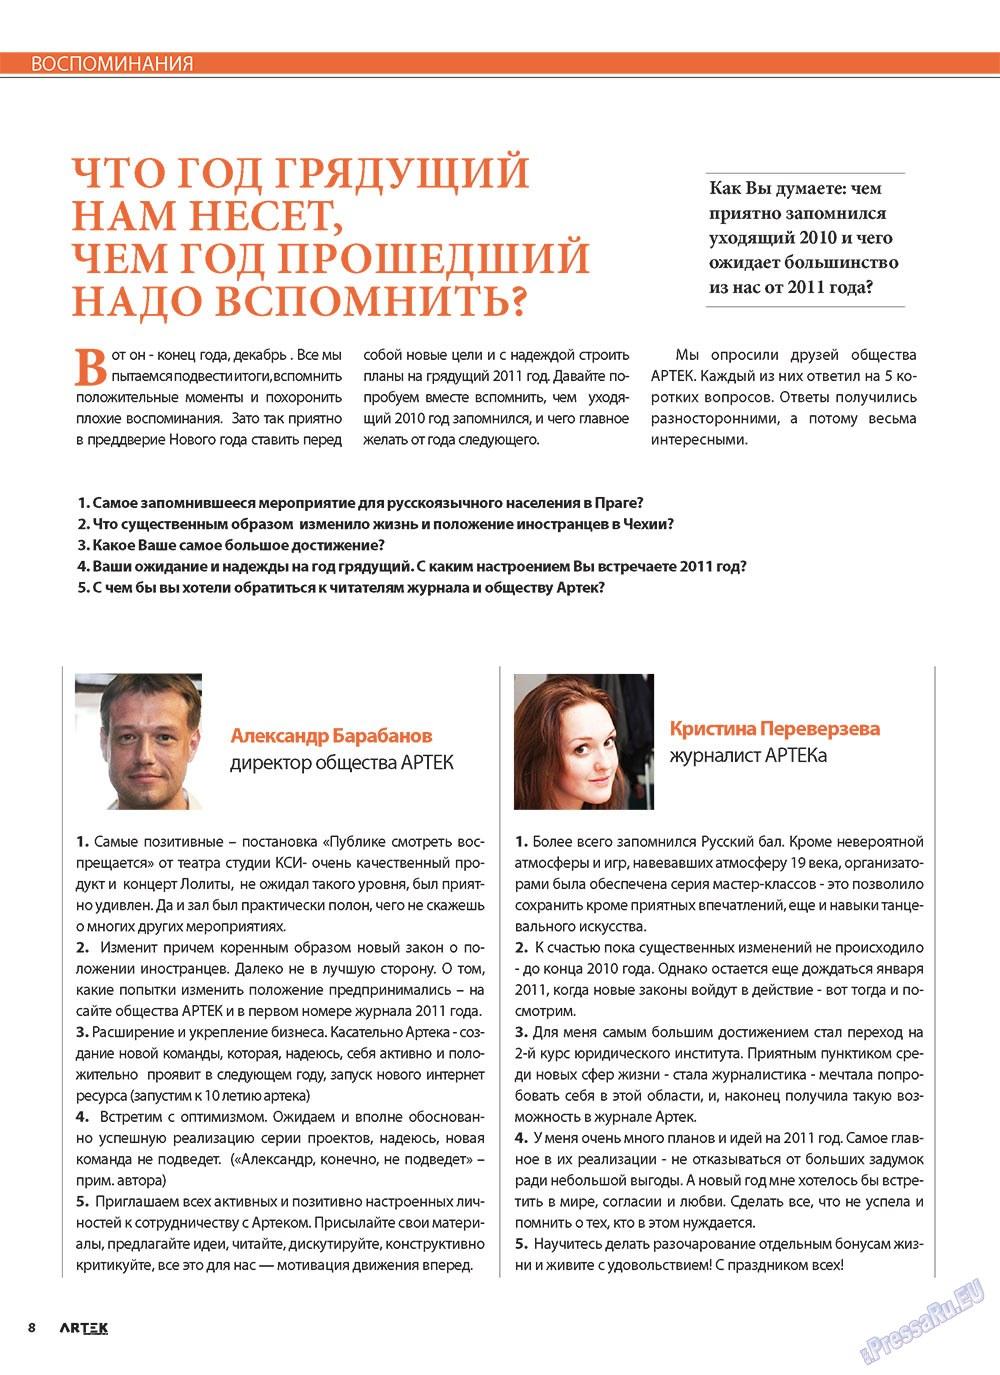 Артек (журнал). 2010 год, номер 6, стр. 10